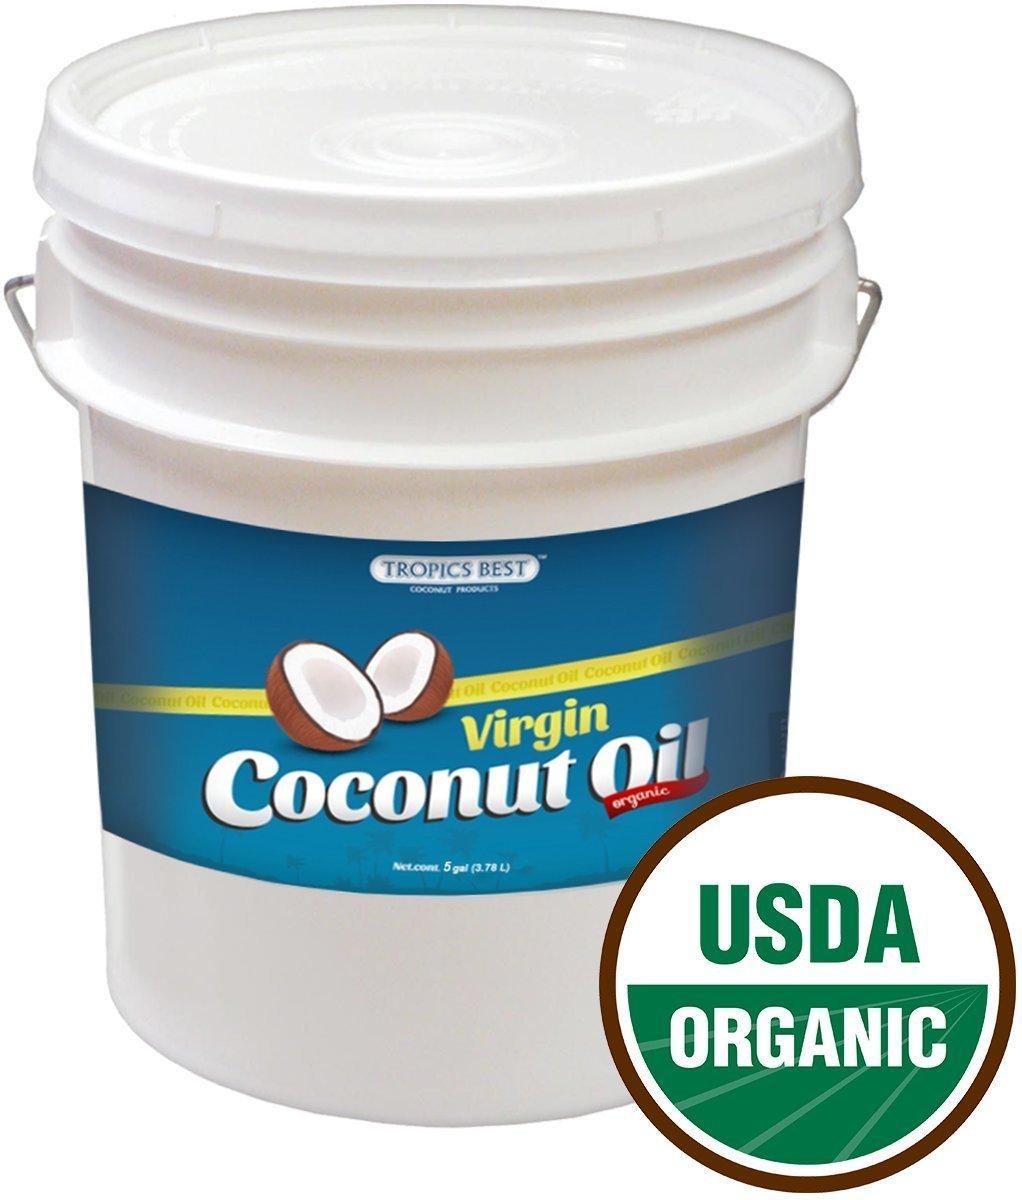 5 Gallon Coconut Oil - 100% USDA Certified Organic Virgin